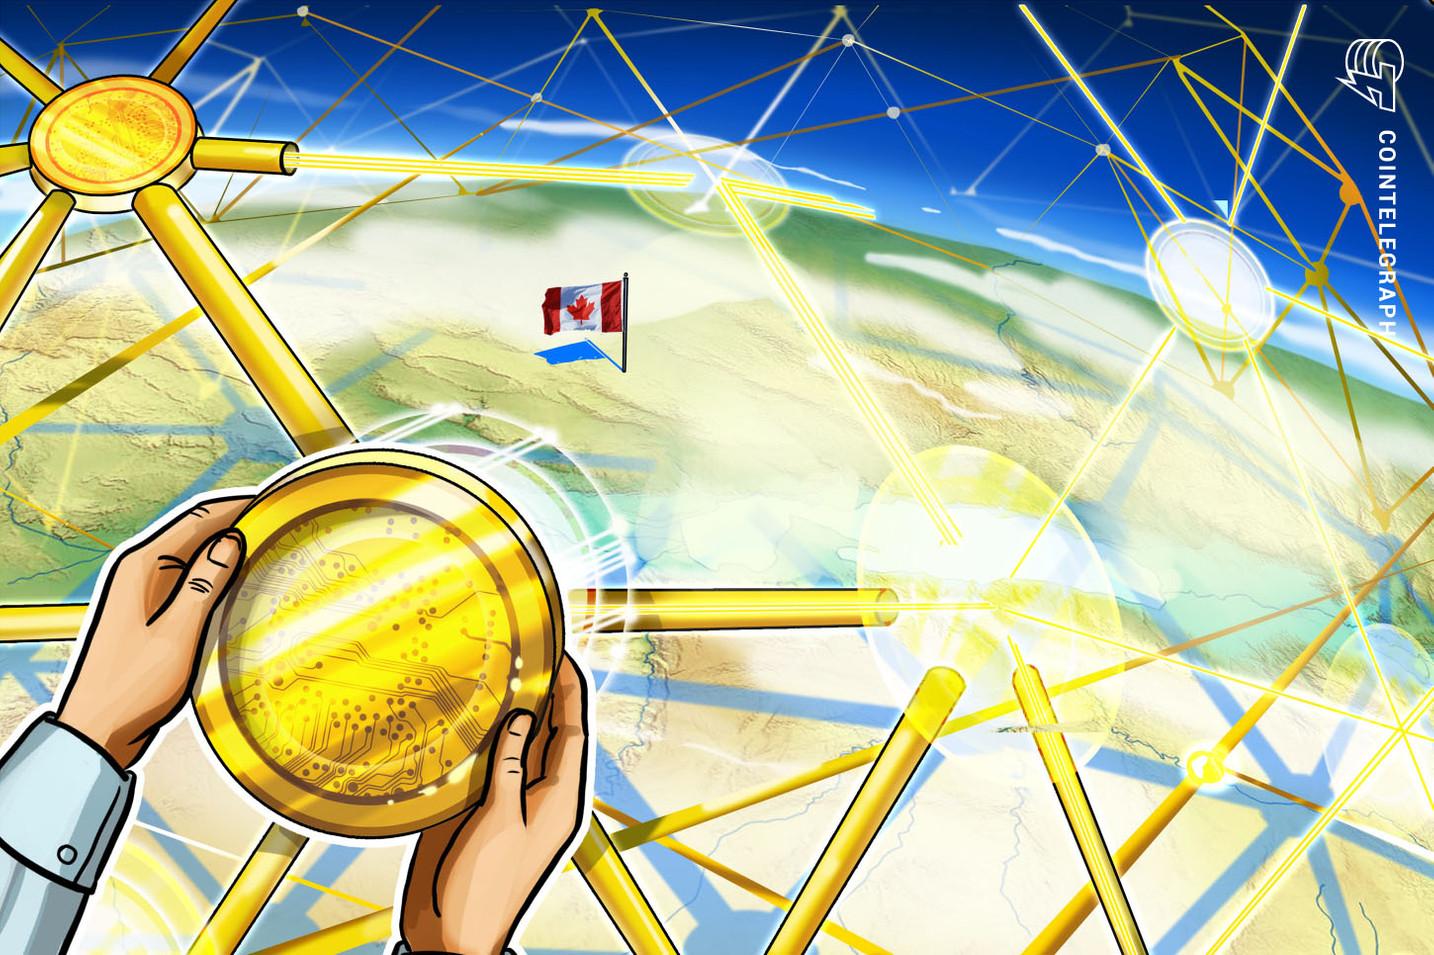 Kanadas Große Koalition der Kreditgenossenschaften tritt R3-Blockchain-Konsortium bei